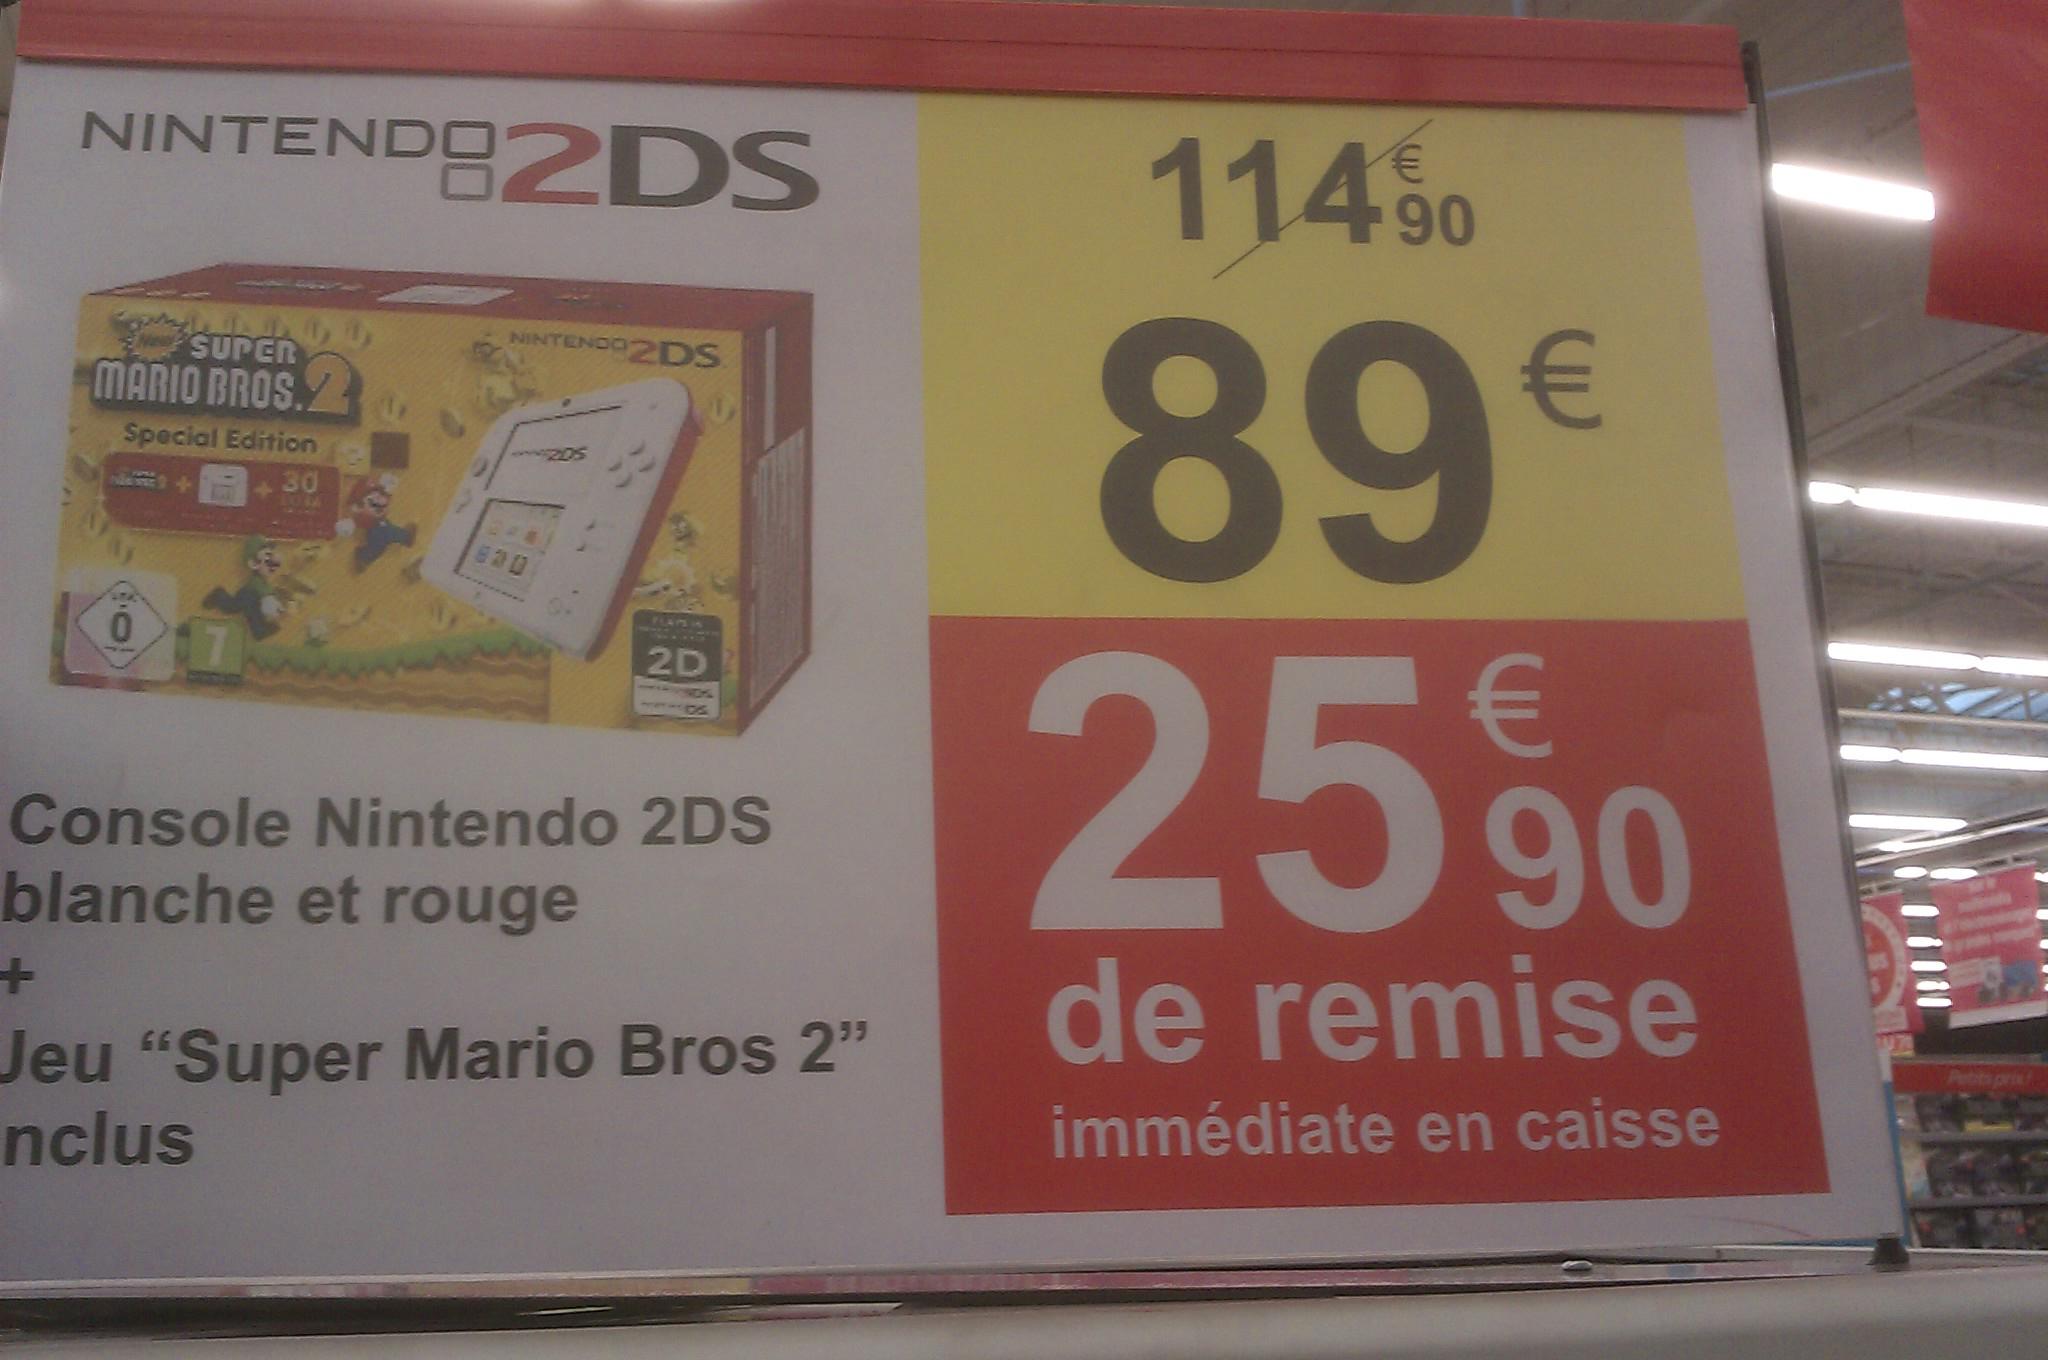 Pack Nintendo 2DS Super Mario Bros 2 Special Edition - Blanc/Rouge